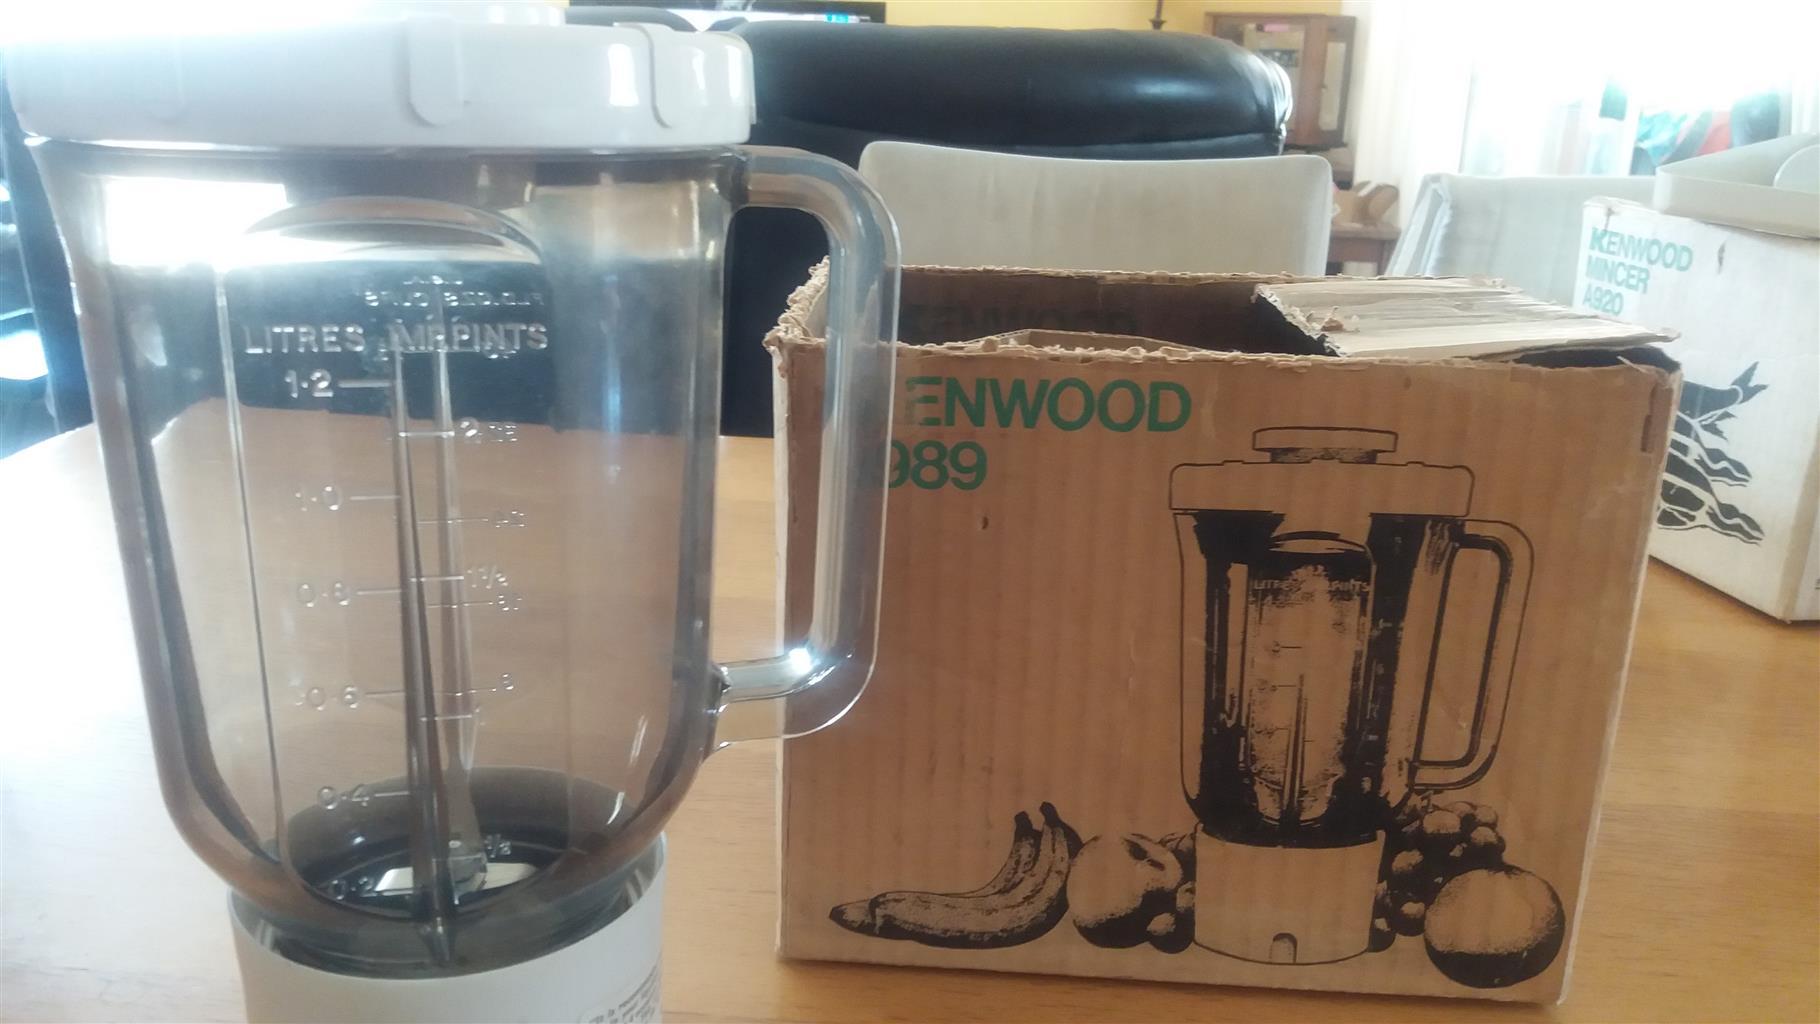 Kenwood liquidizer for Chef mixer